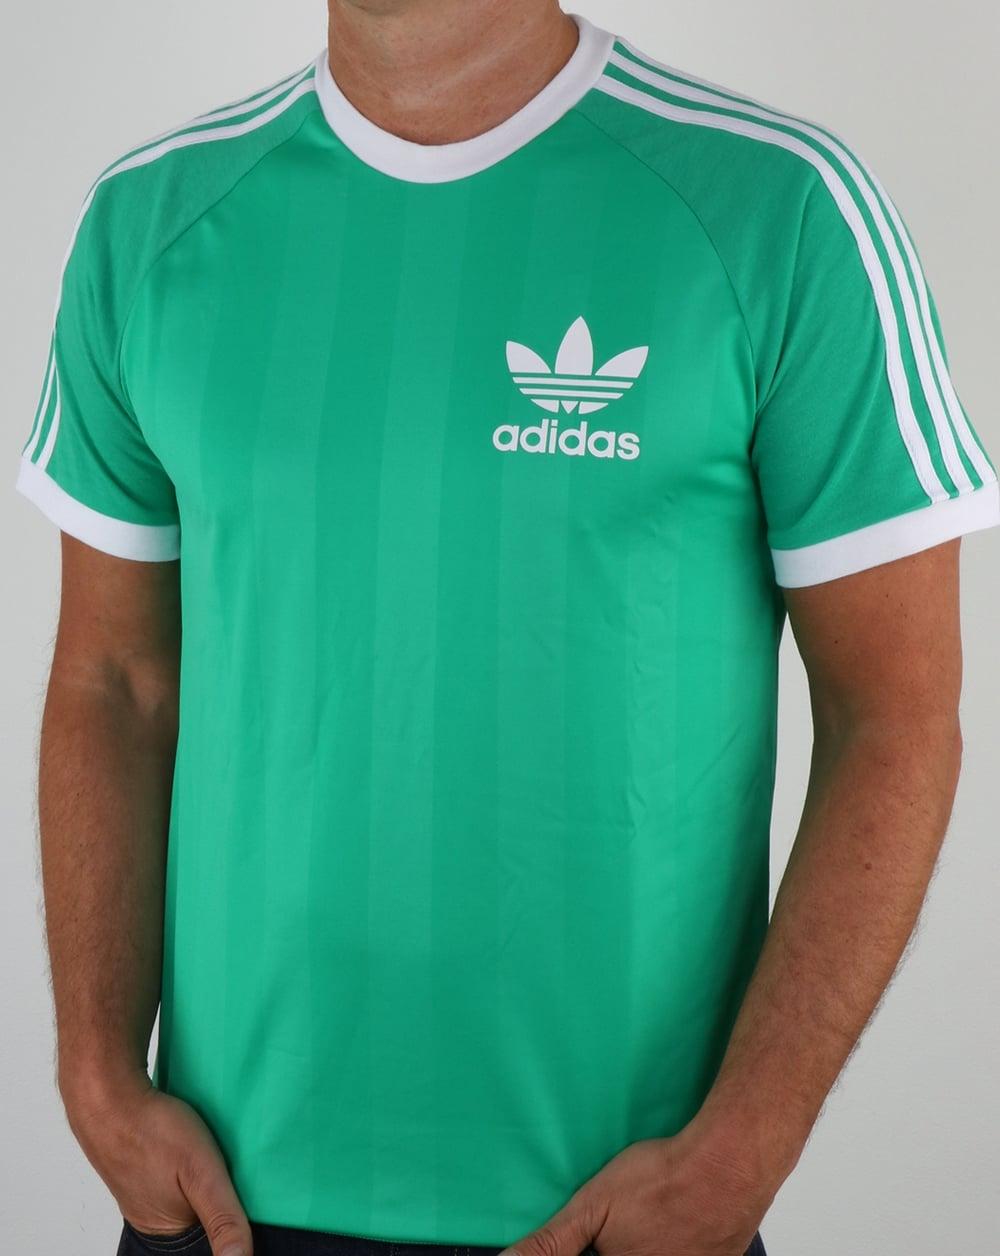 Adidas Originals Old Skool T Shirt Core Green,football ...